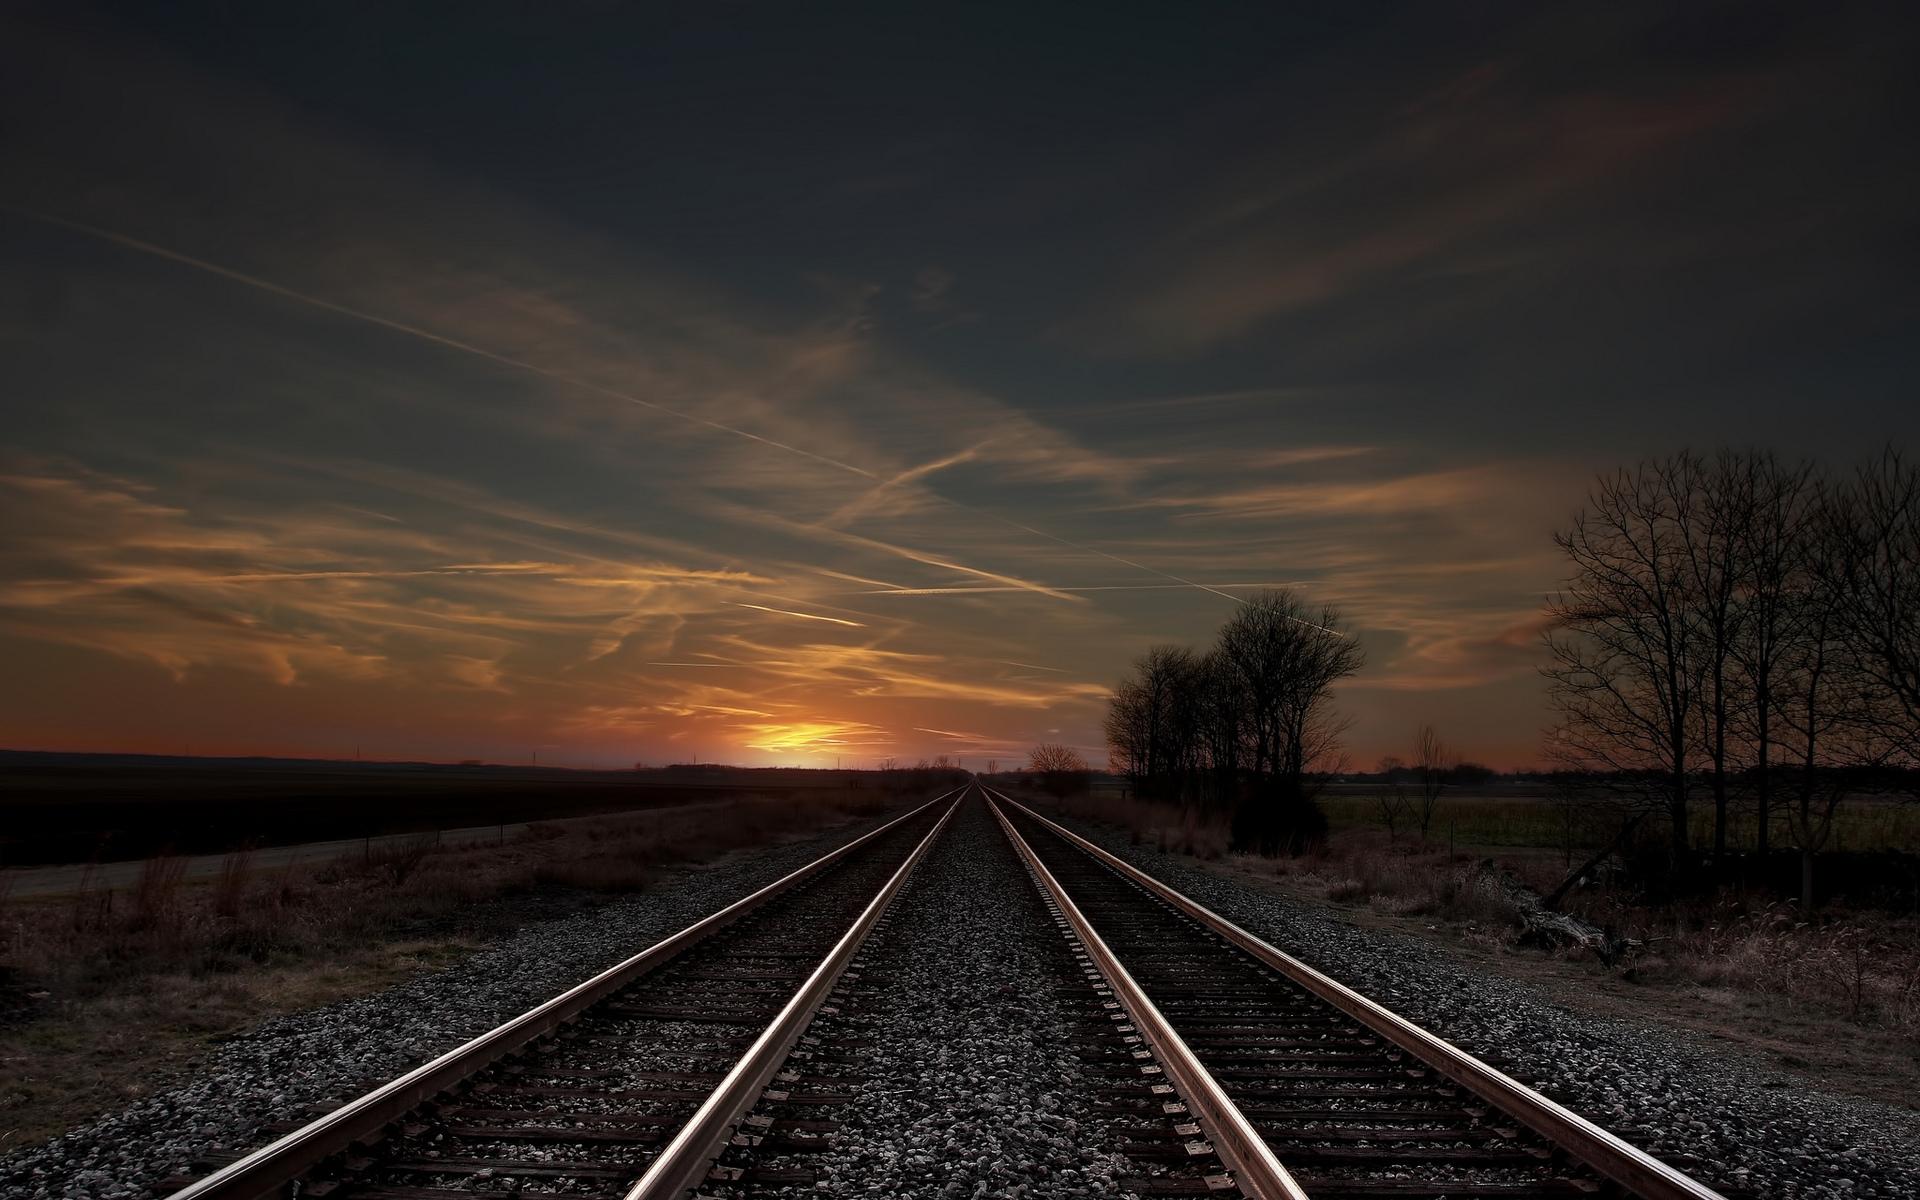 track field sunset evening trees railroad wallpaper background 1920x1200